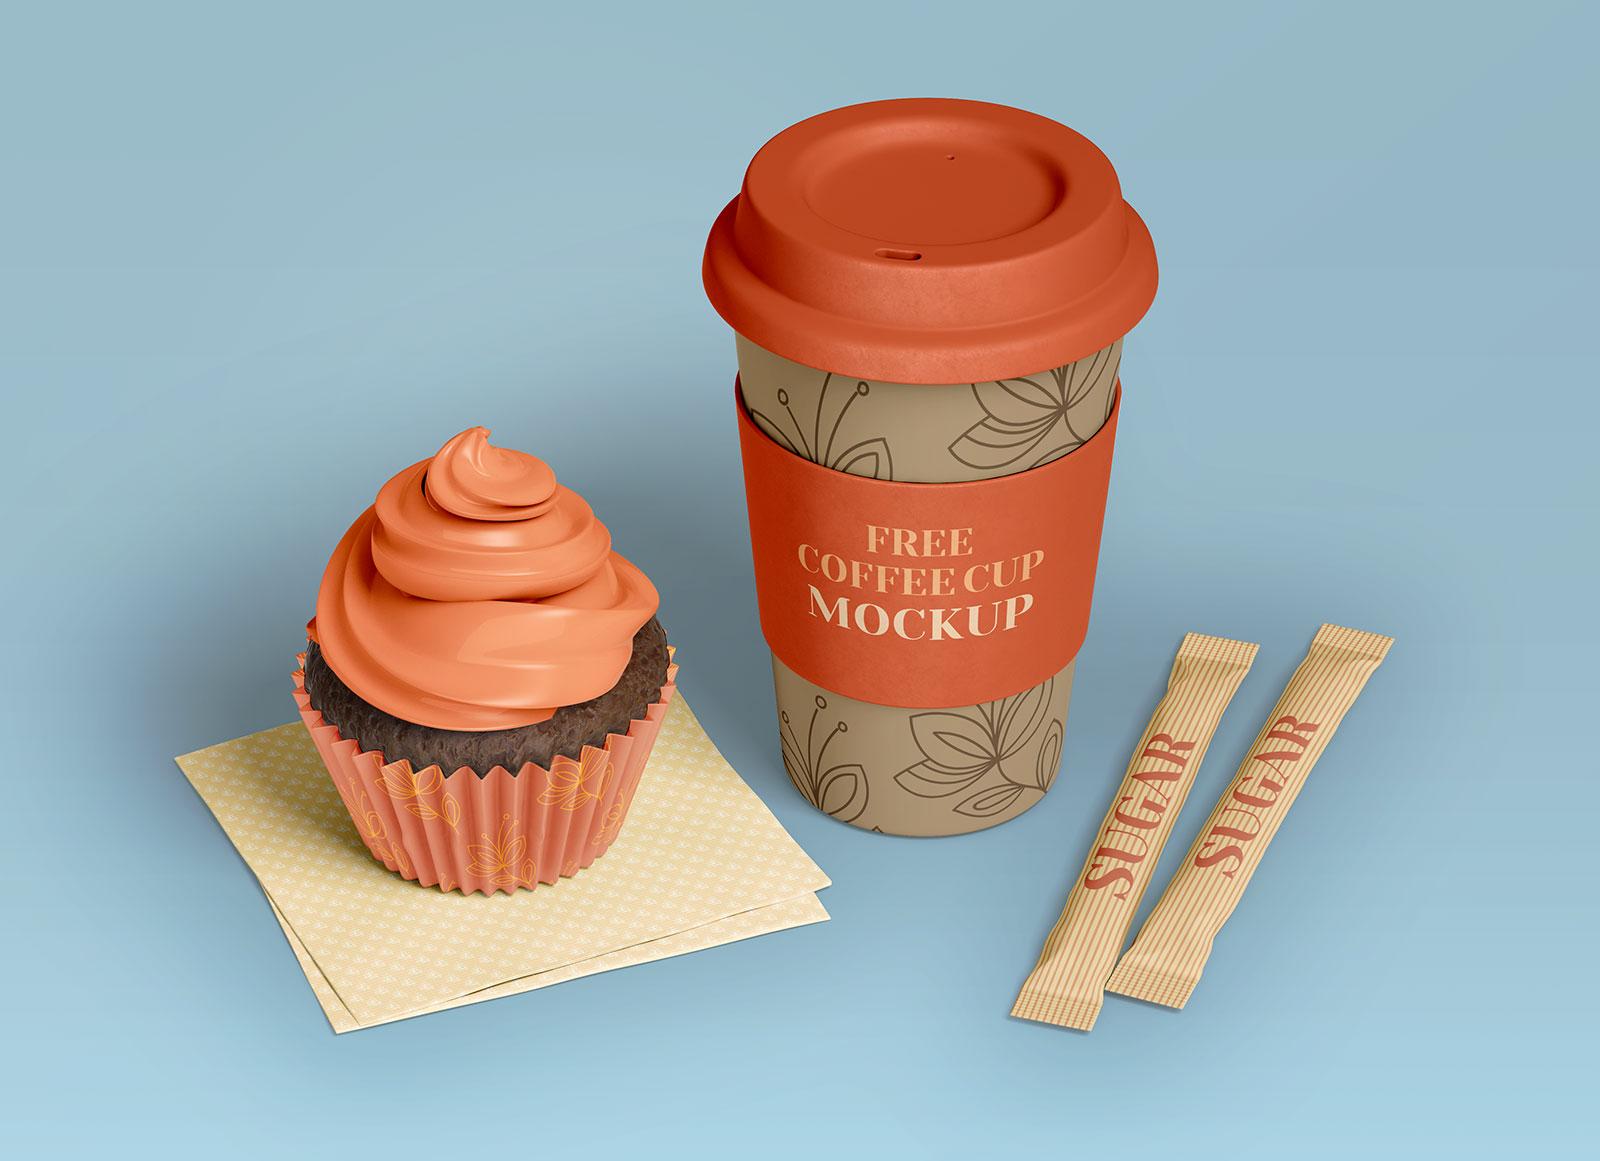 Free-Coffee-Cup,-Cupcake-&-Sugar-Sachet-Mockup-PSD-Set